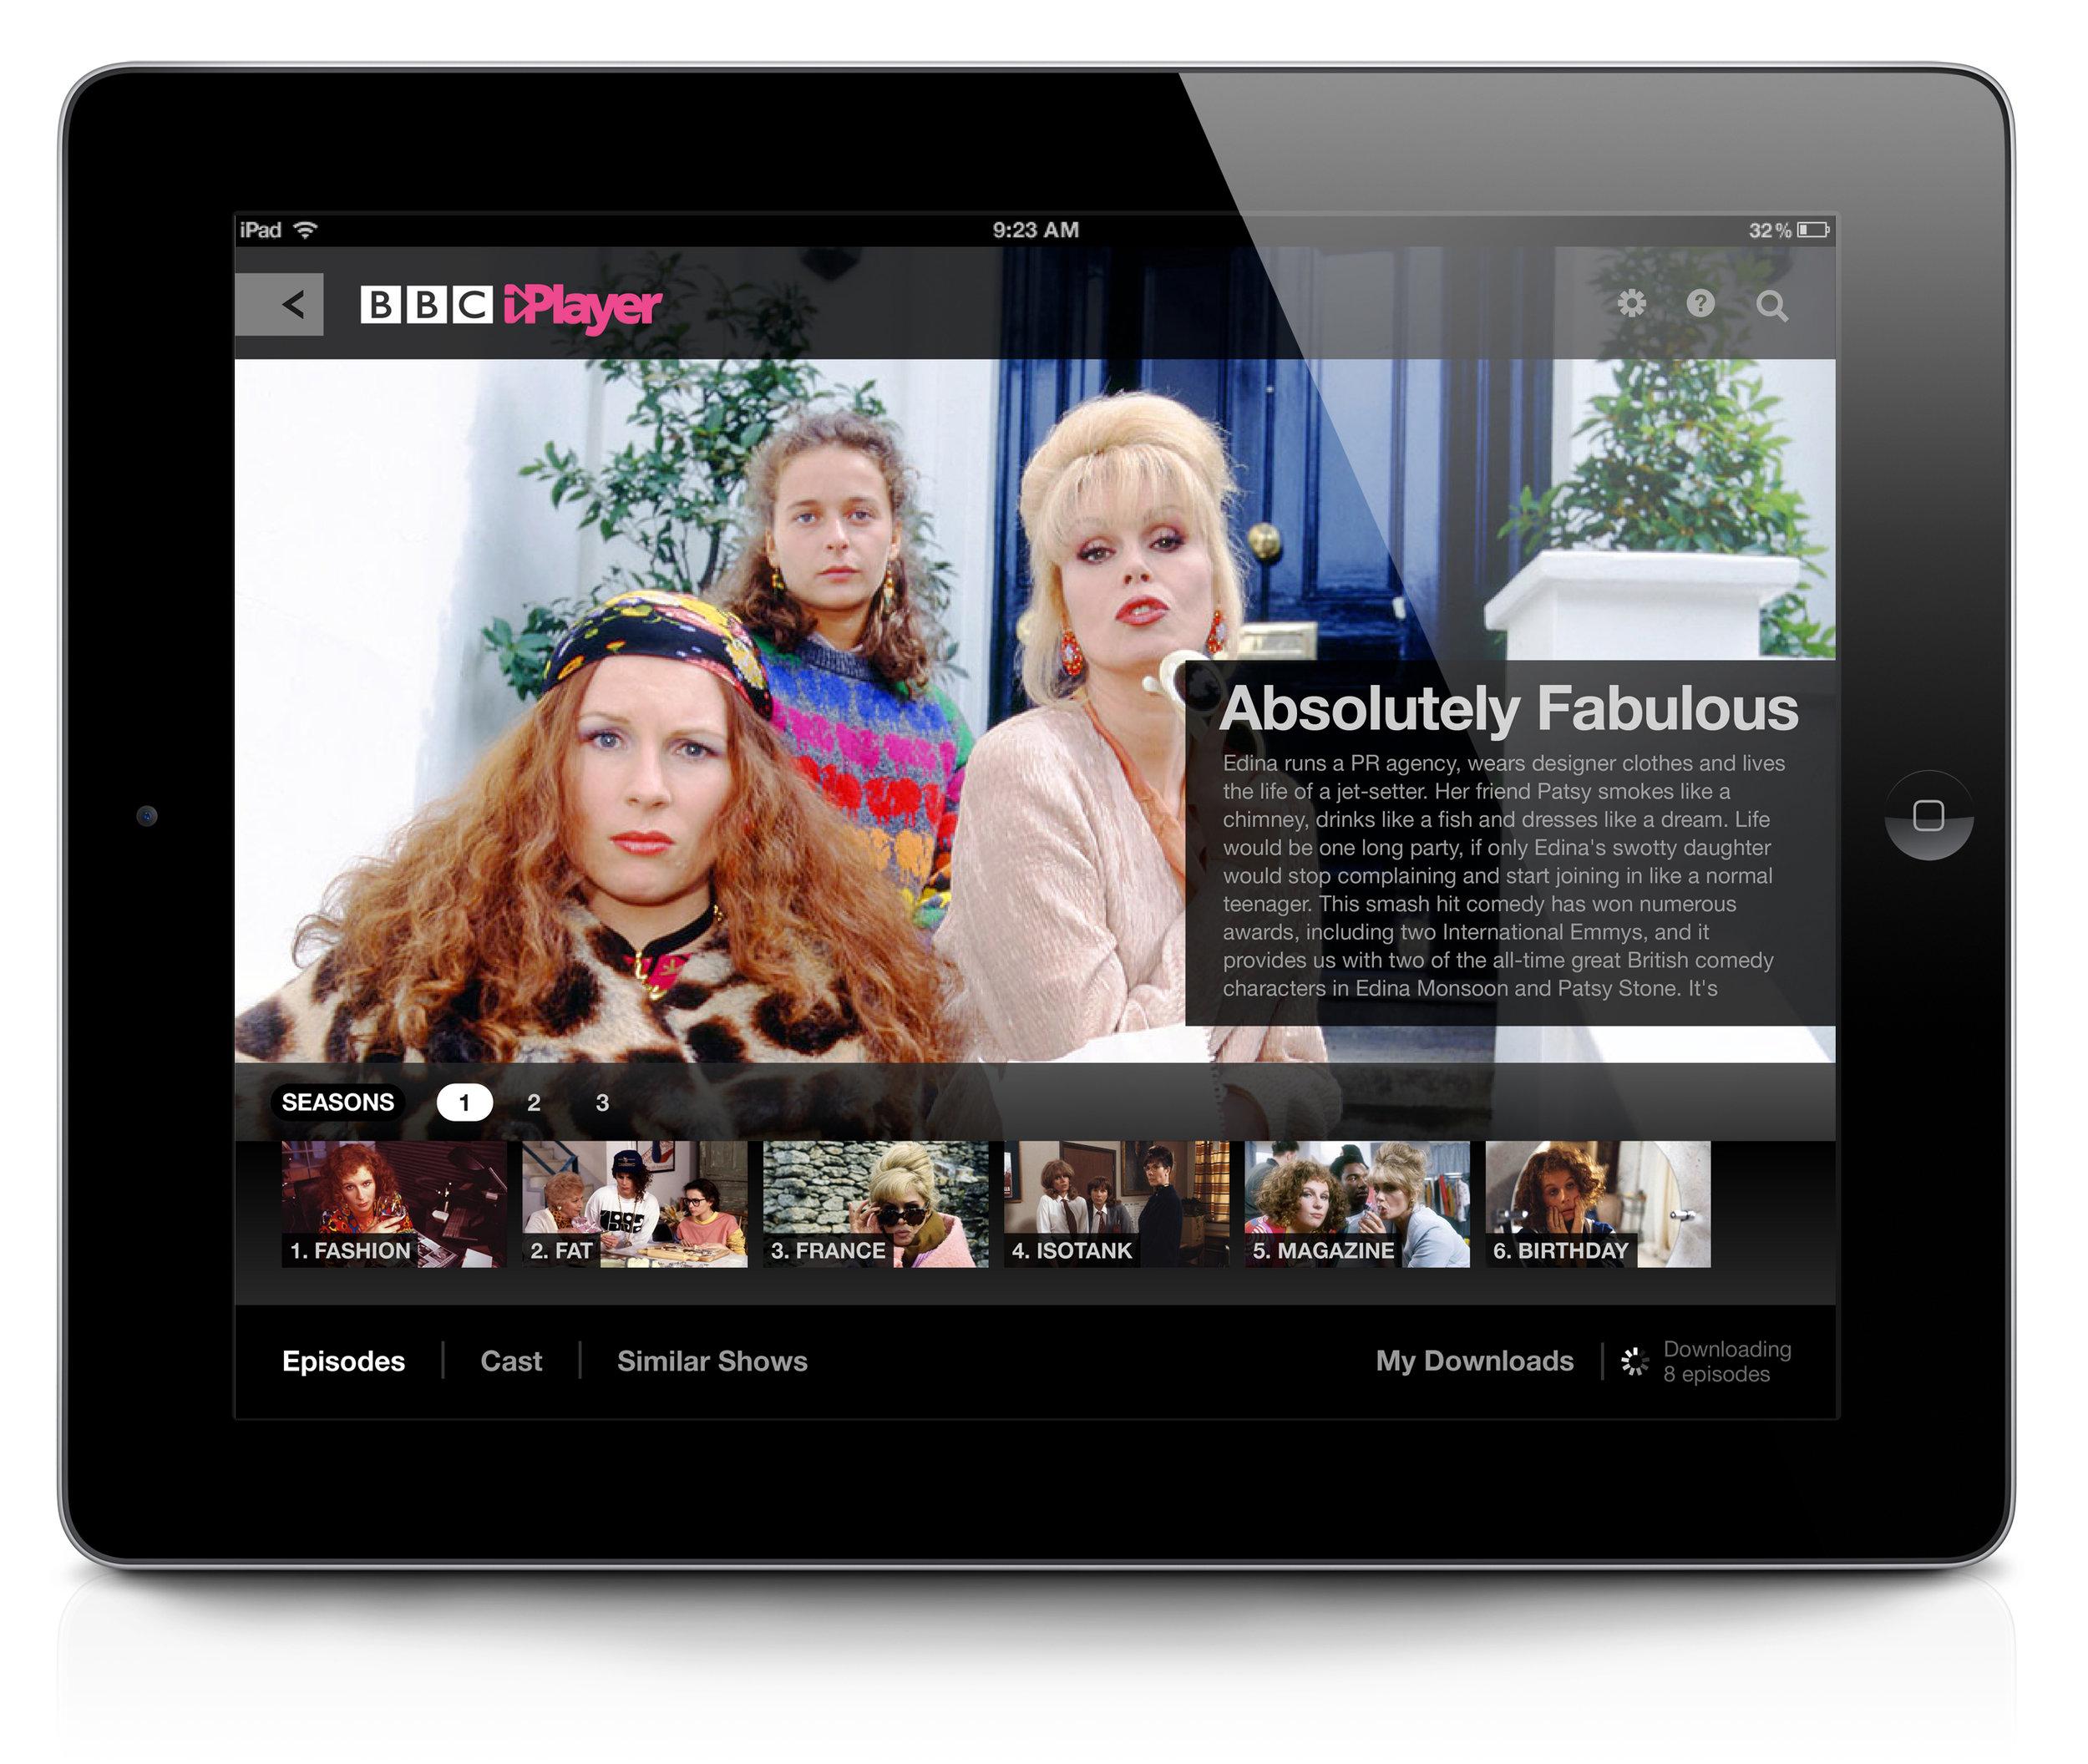 iPlayer_iPad2_ShowPage.jpg